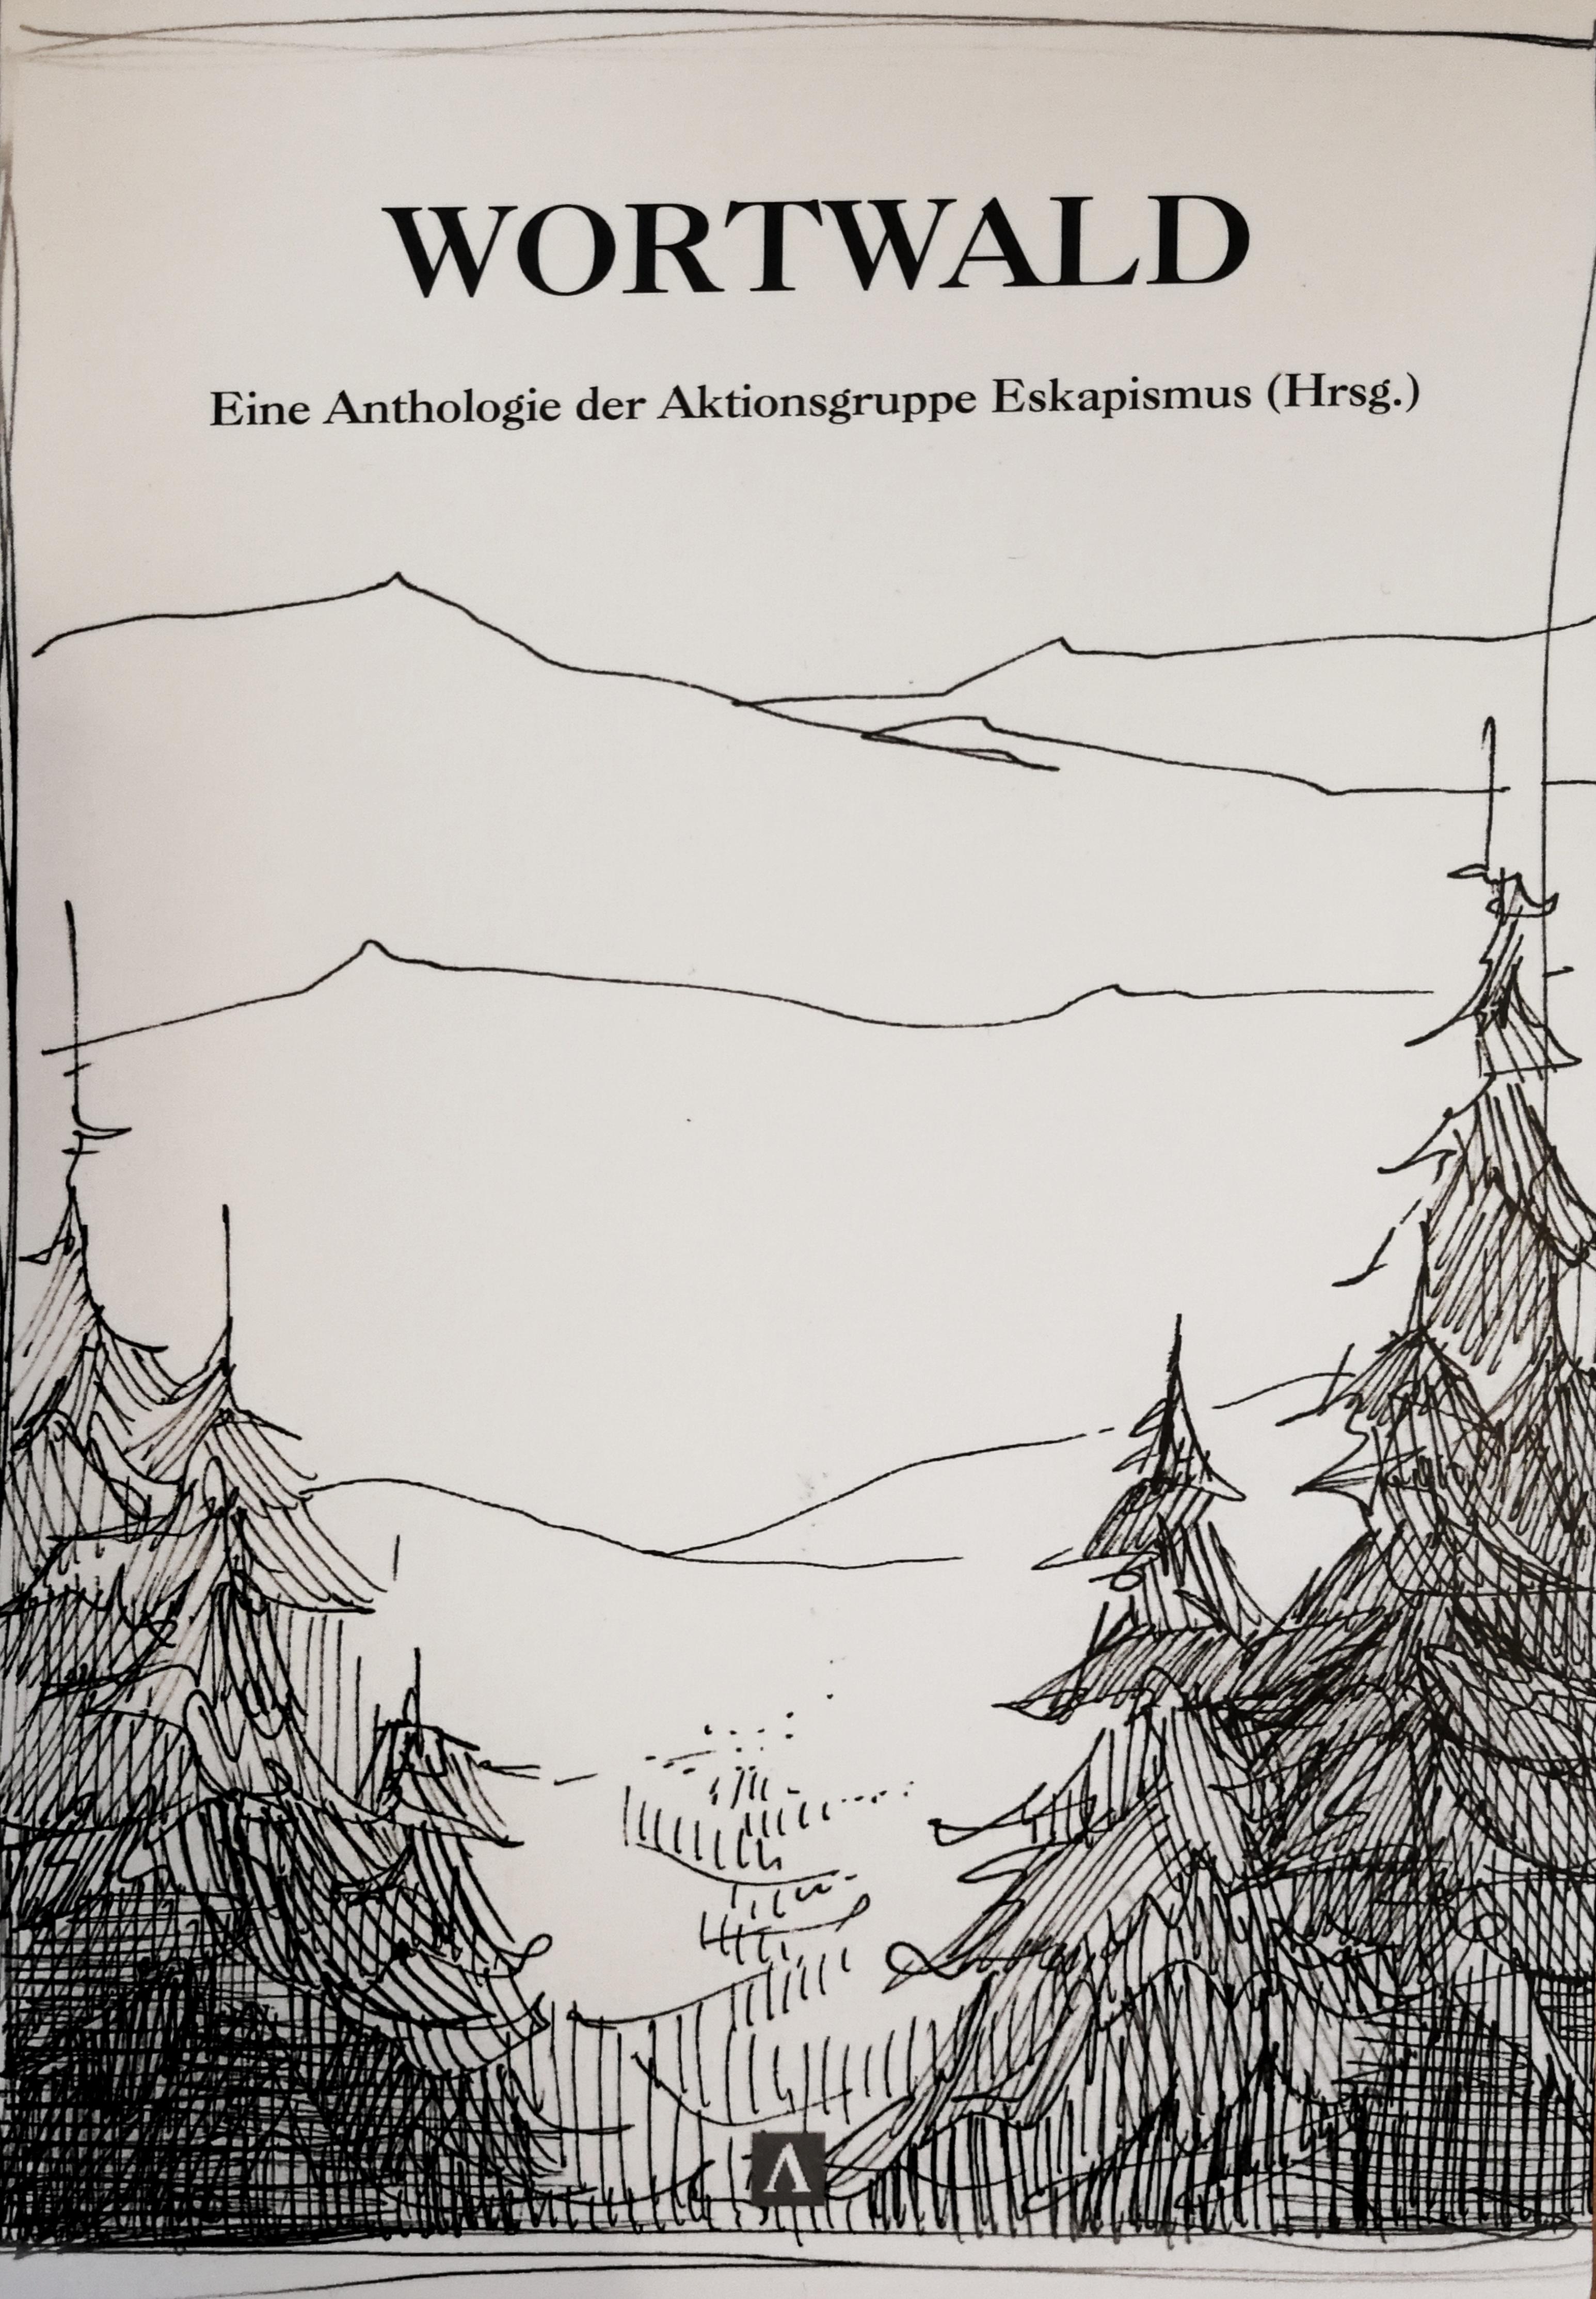 Wortwald